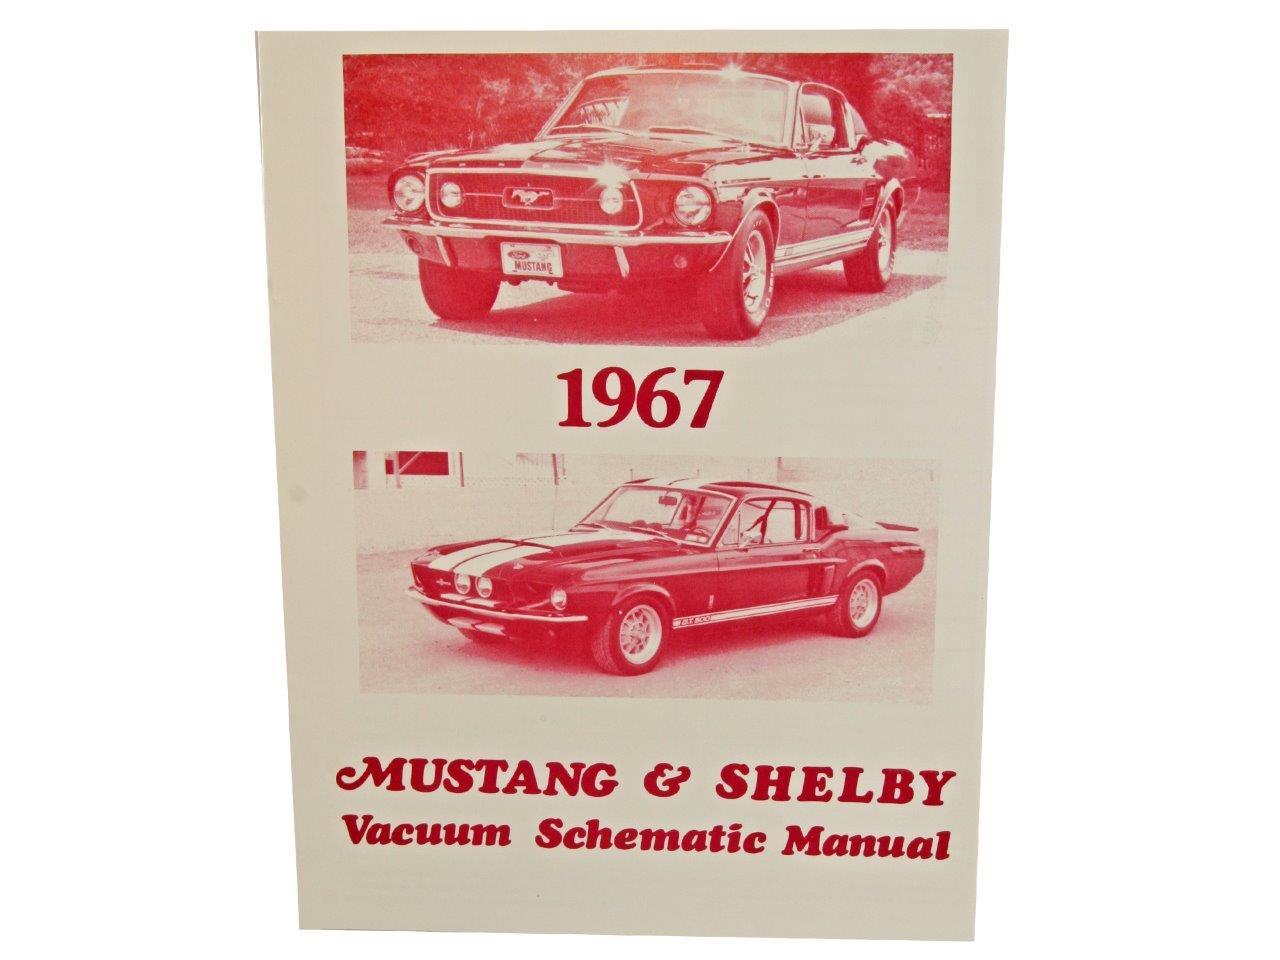 1967 ford mustang technisches handbuch unterdrucksystem mp 150. Black Bedroom Furniture Sets. Home Design Ideas